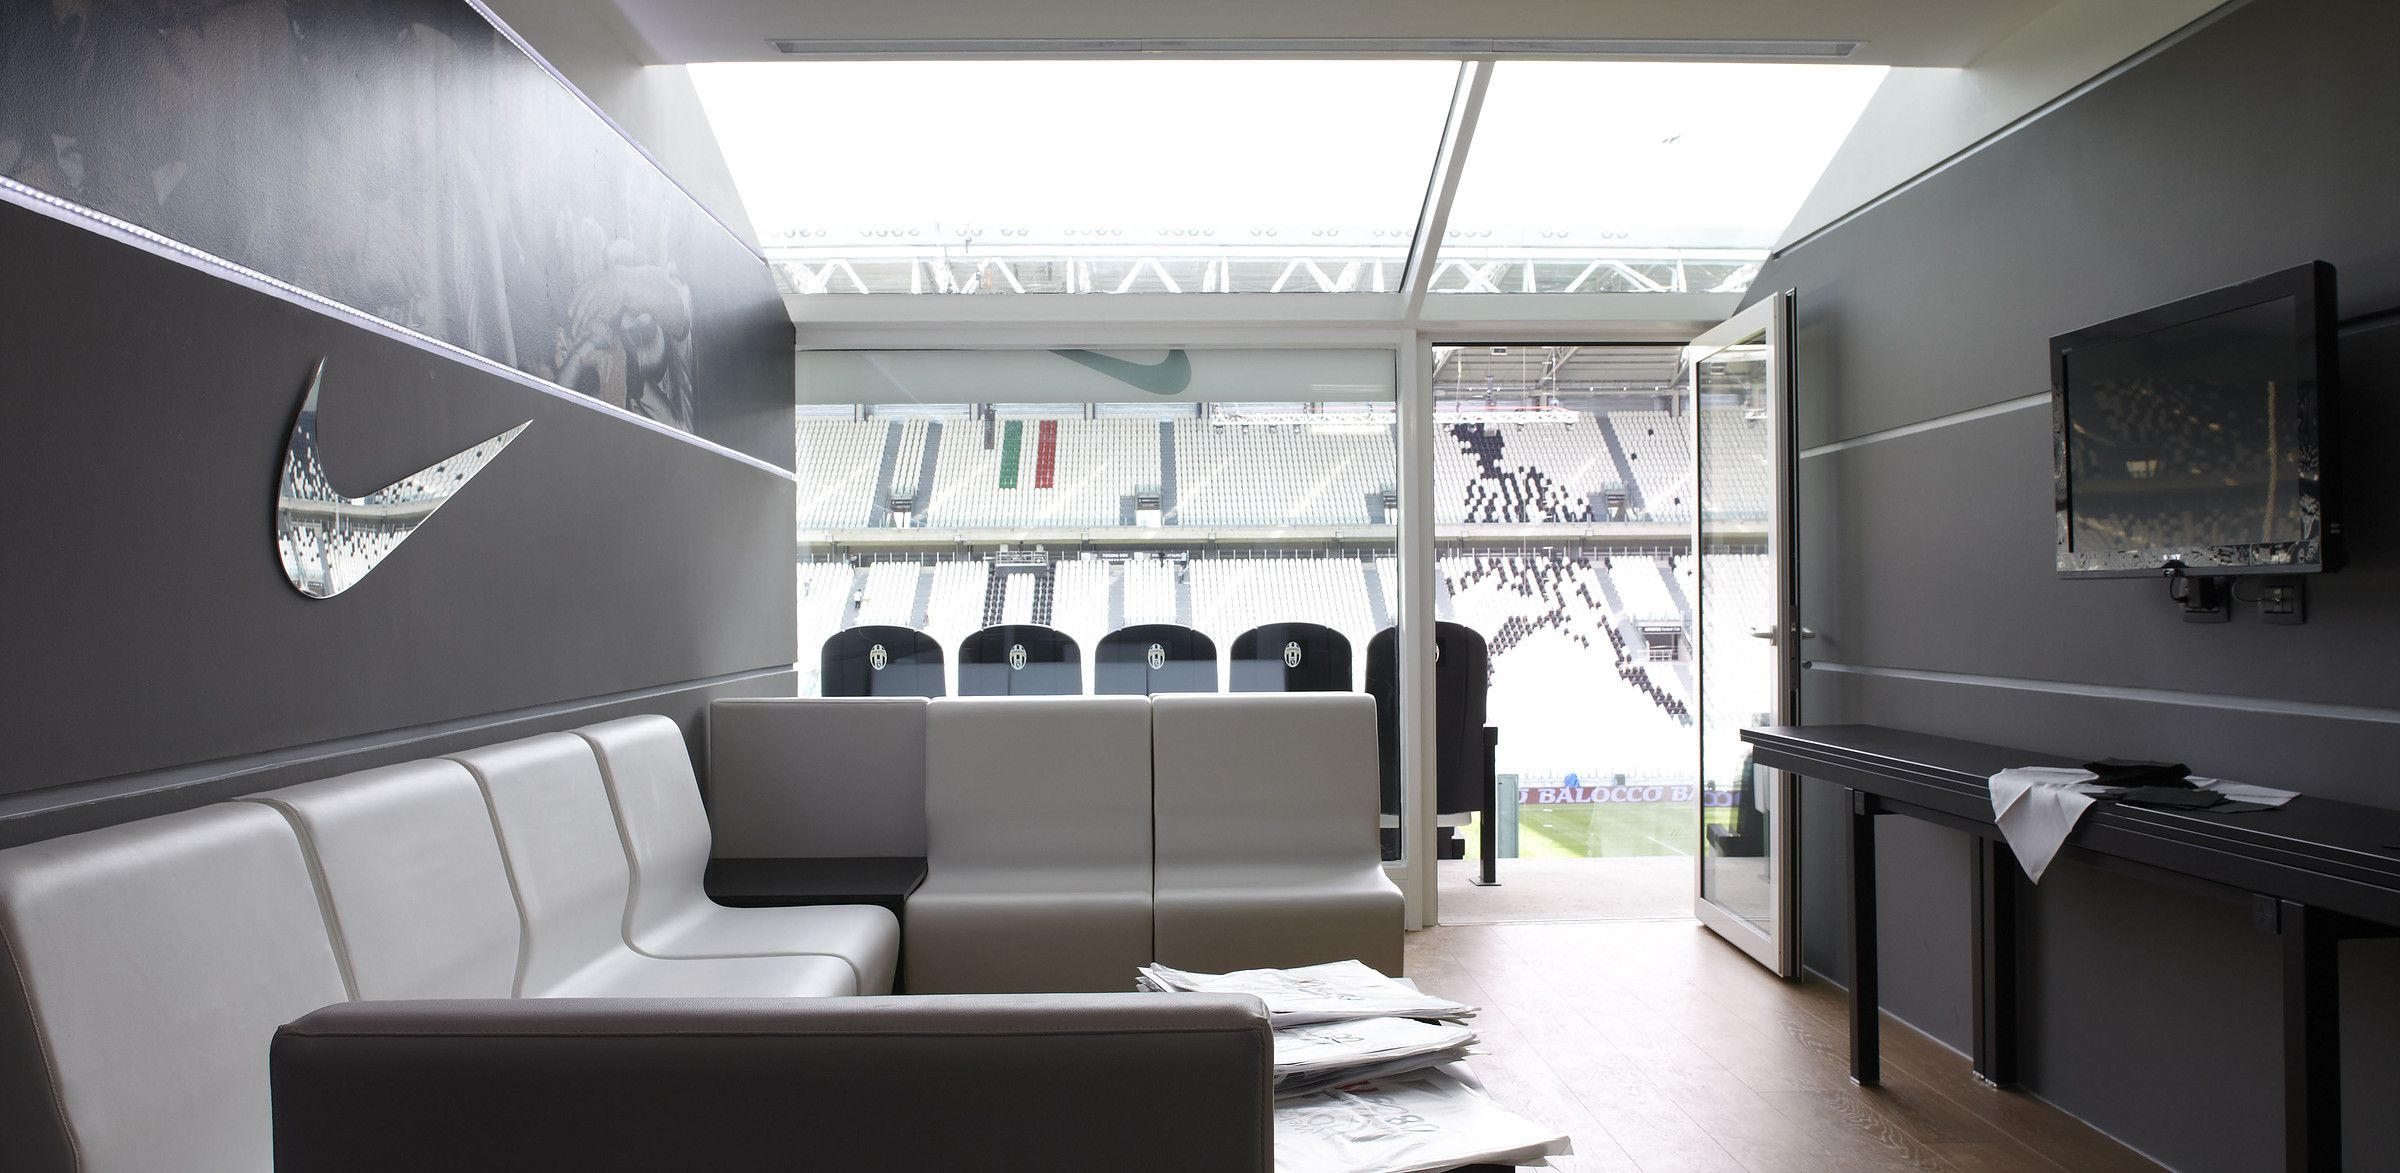 juventus stadium box torino office interiors interior home decor juventus stadium box torino office